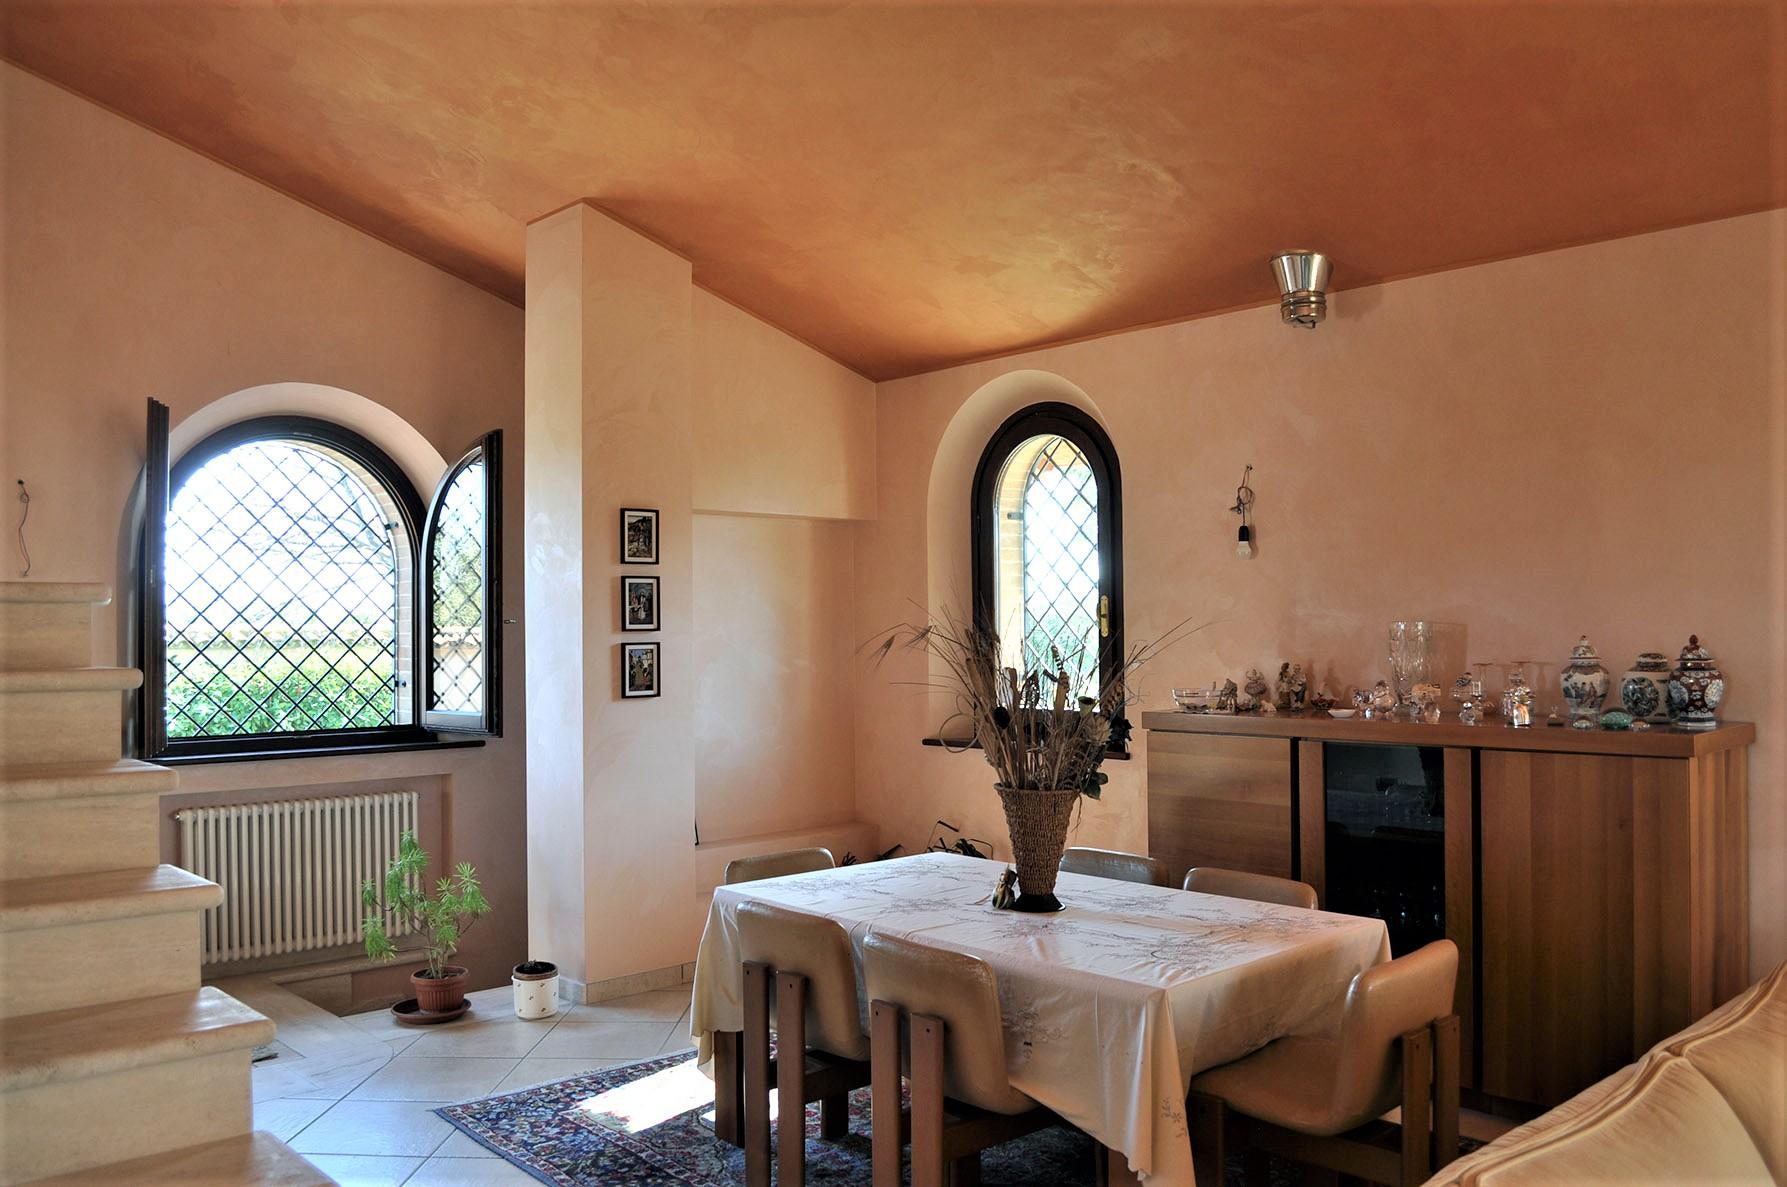 Villa Villa for sale Tortoreto (TE), Villa Bianca - Tortoreto - EUR 770.233 620